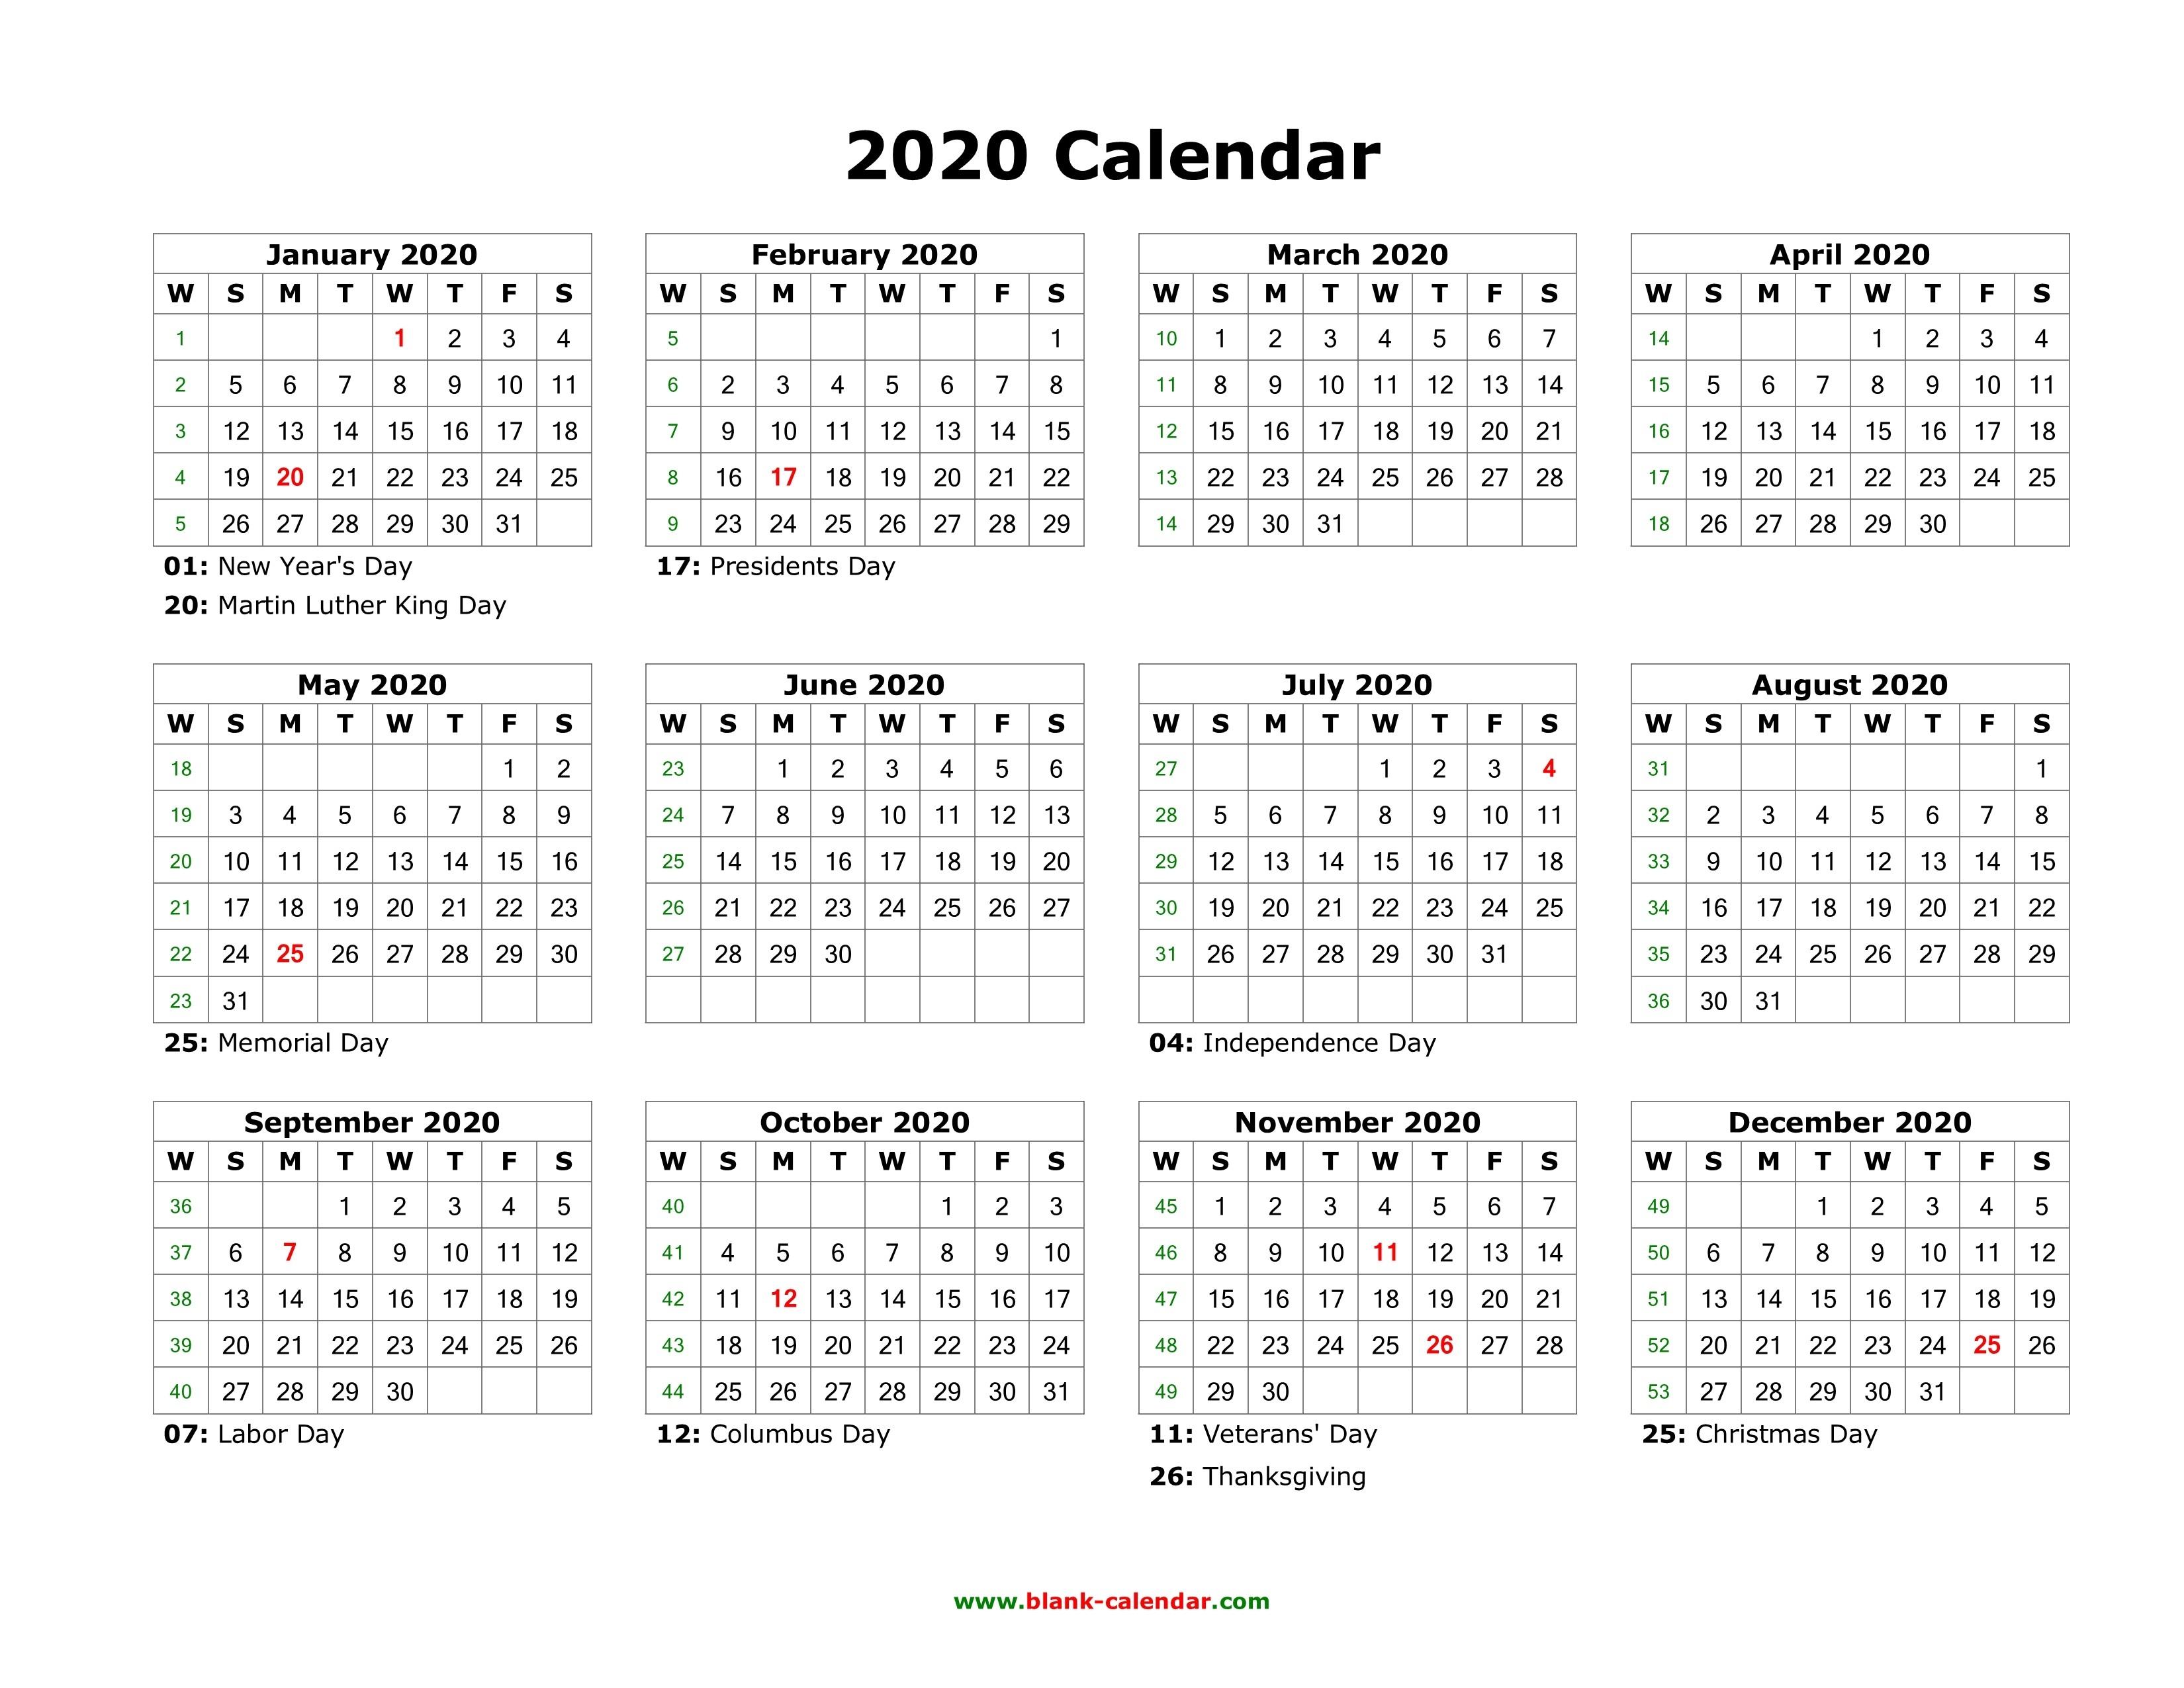 Blank Calendar 2020 | Free Download Calendar Templates-Blank Calandar Of Events 2020